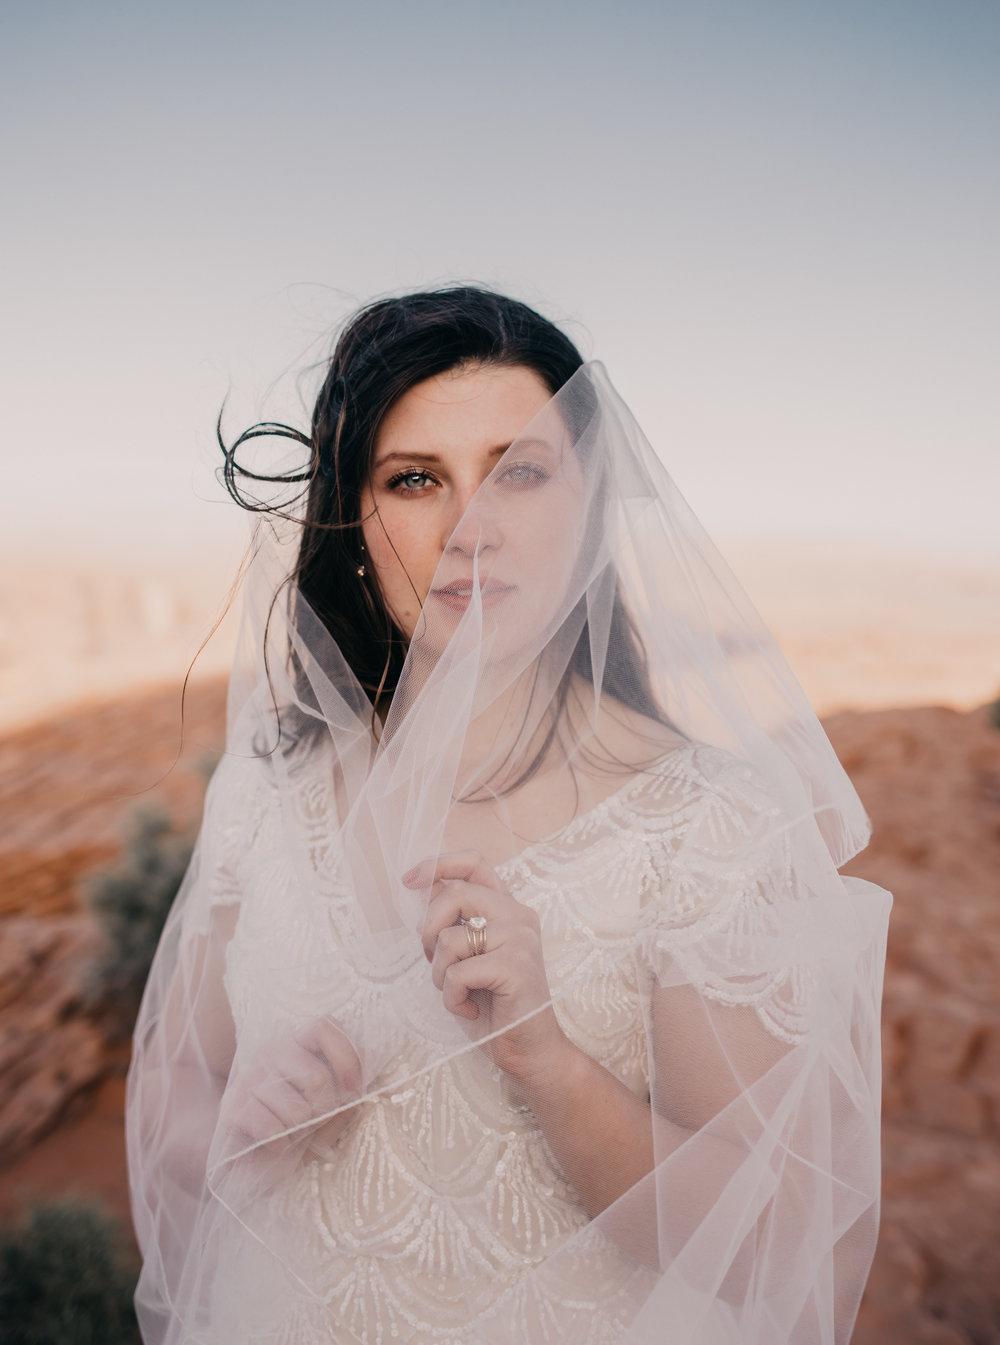 bride at horse shoe bend